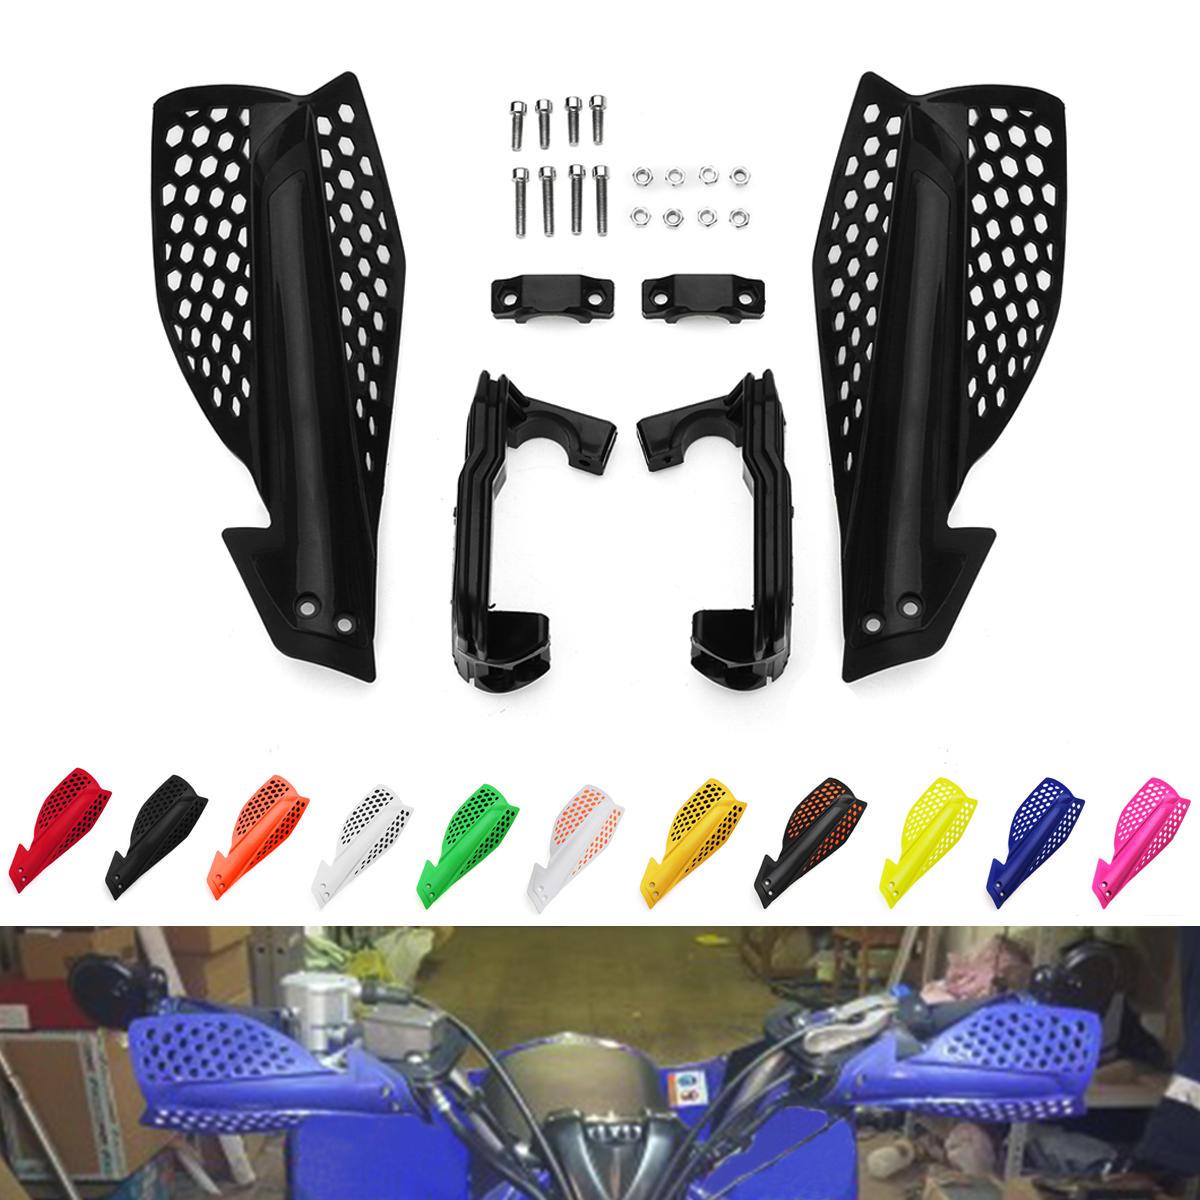 Moto 22mm Handbar Hand Guards Motocross Protezione per la protezione Protezione Dirt Bike Pit Bike ATV Quads